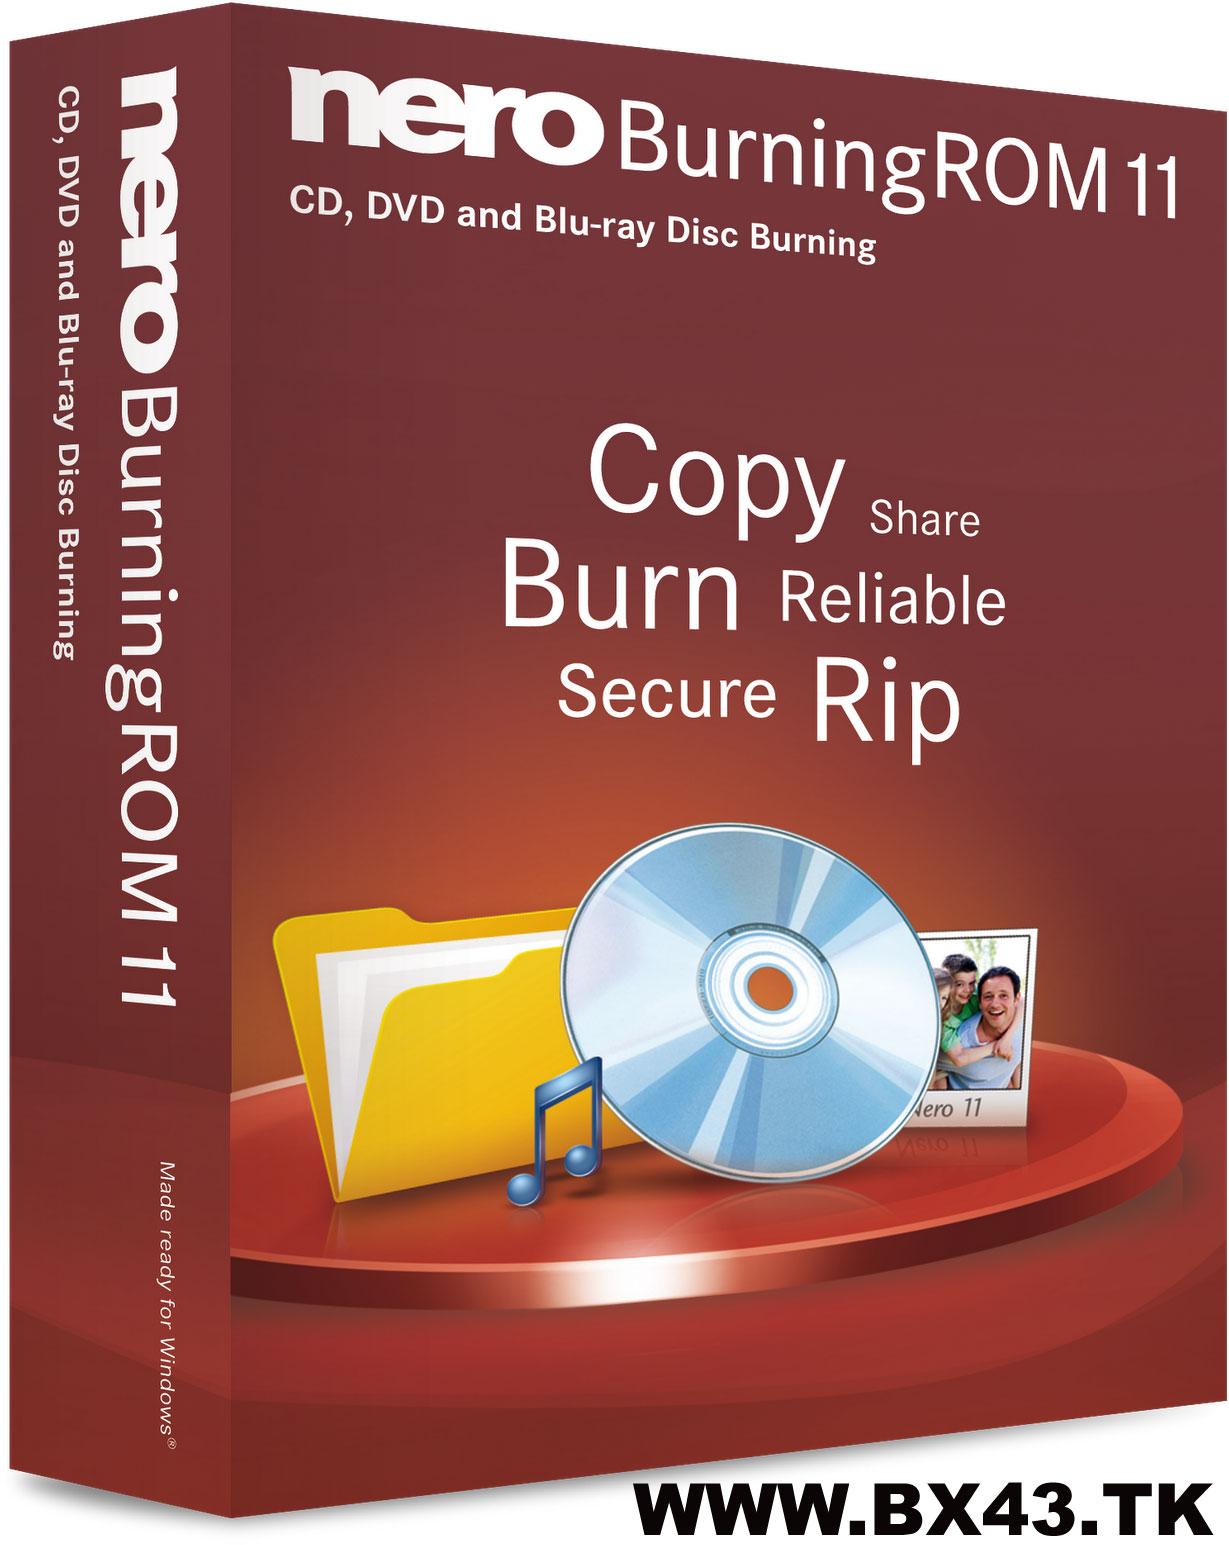 download nero burning room